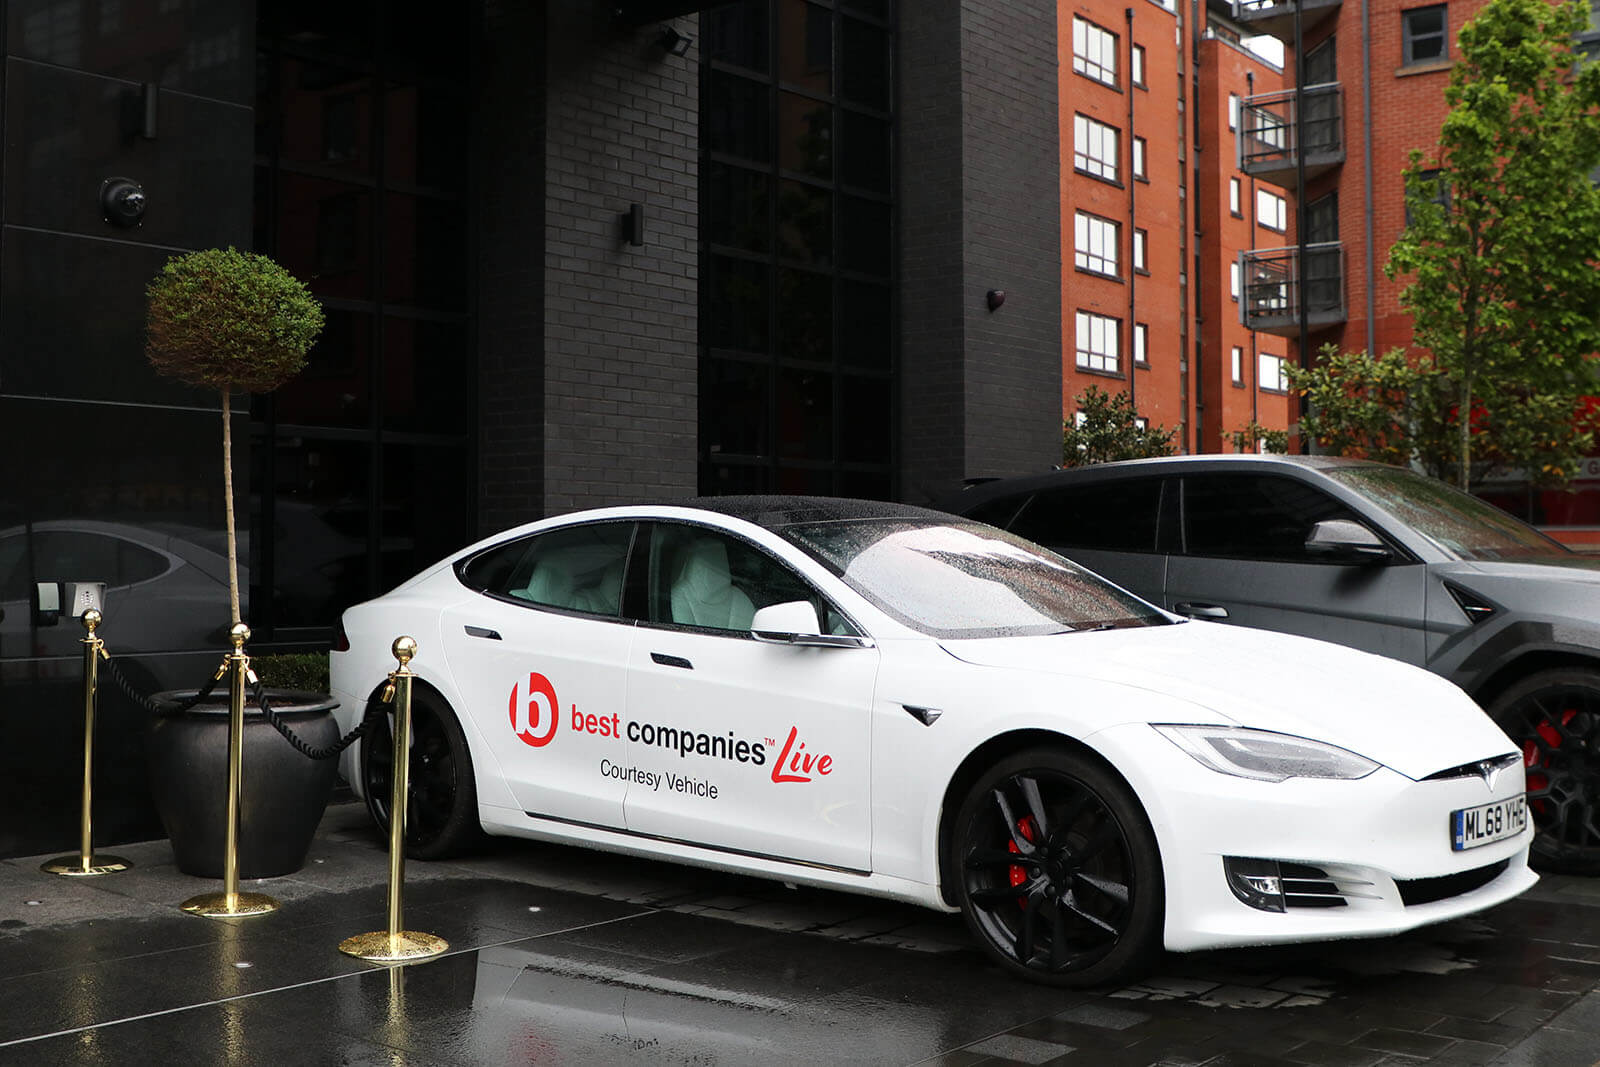 Best Companies Live branded Telsa Curtsey Vehicle